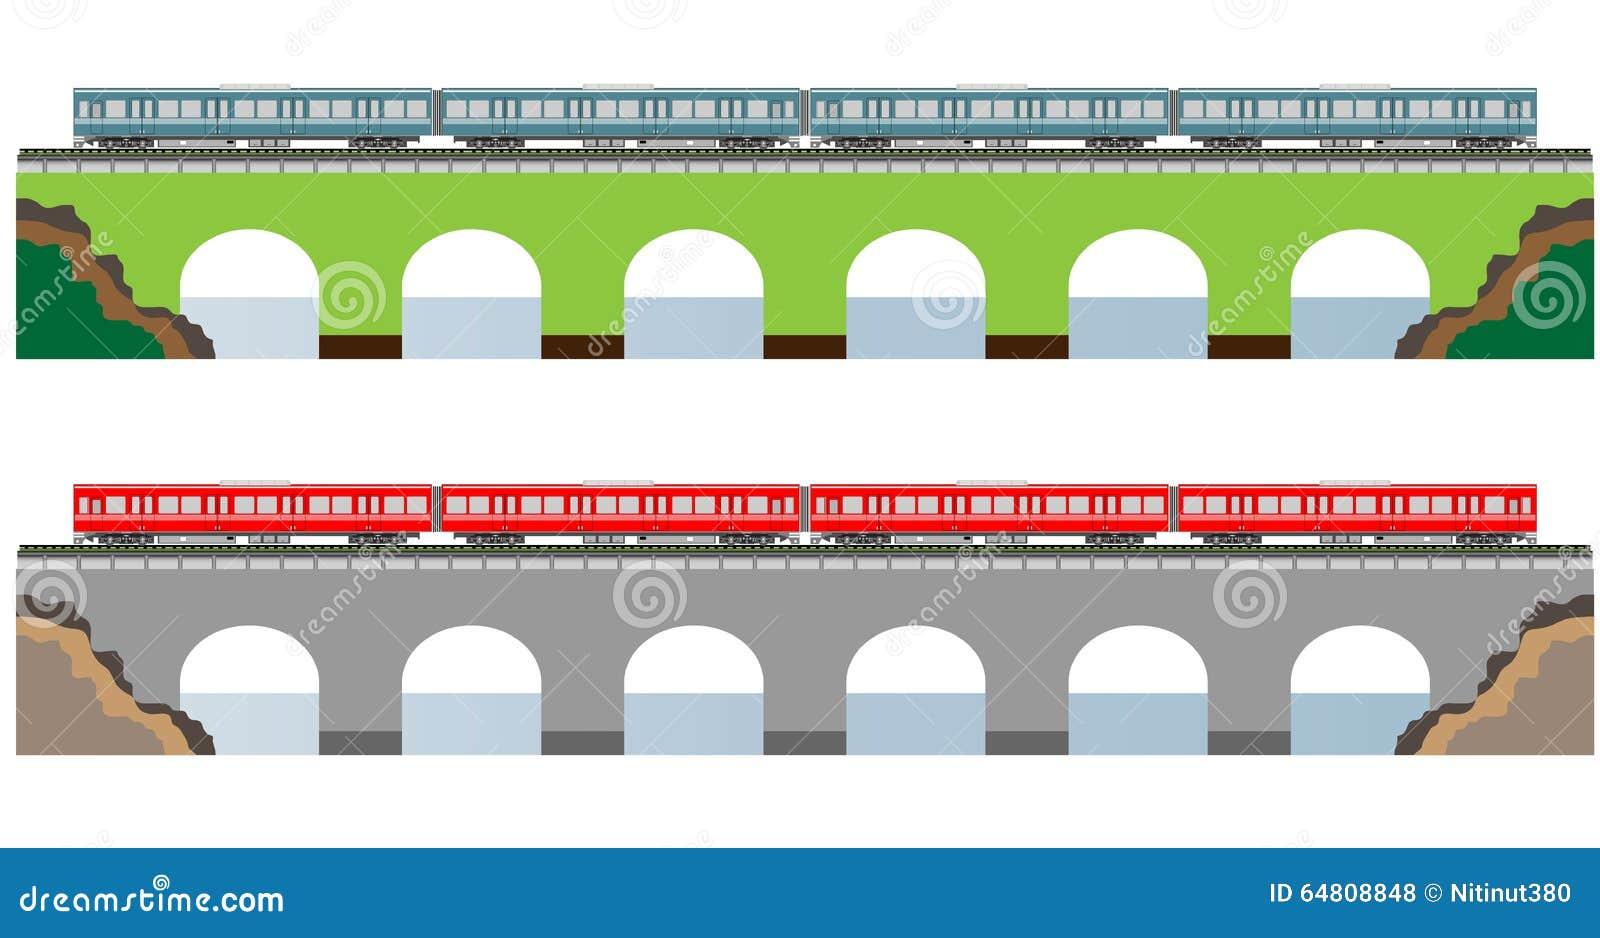 Train Bridge Illustration Stock Illustrations 3 634 Train Bridge Illustration Stock Illustrations Vectors Clipart Dreamstime